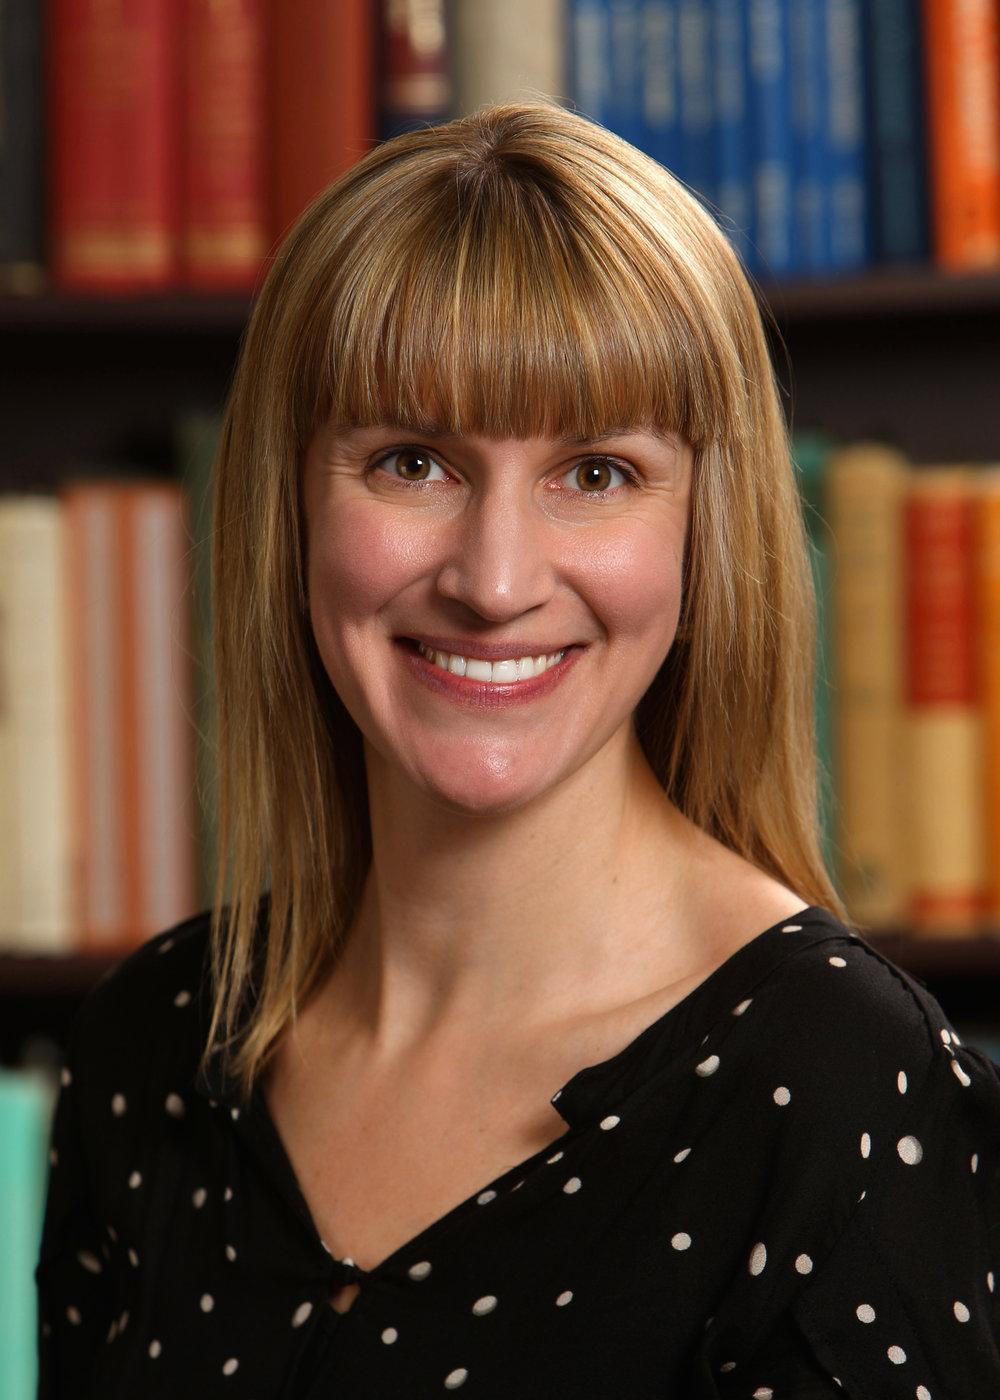 Dr. Selene Etches, Dalhousie University